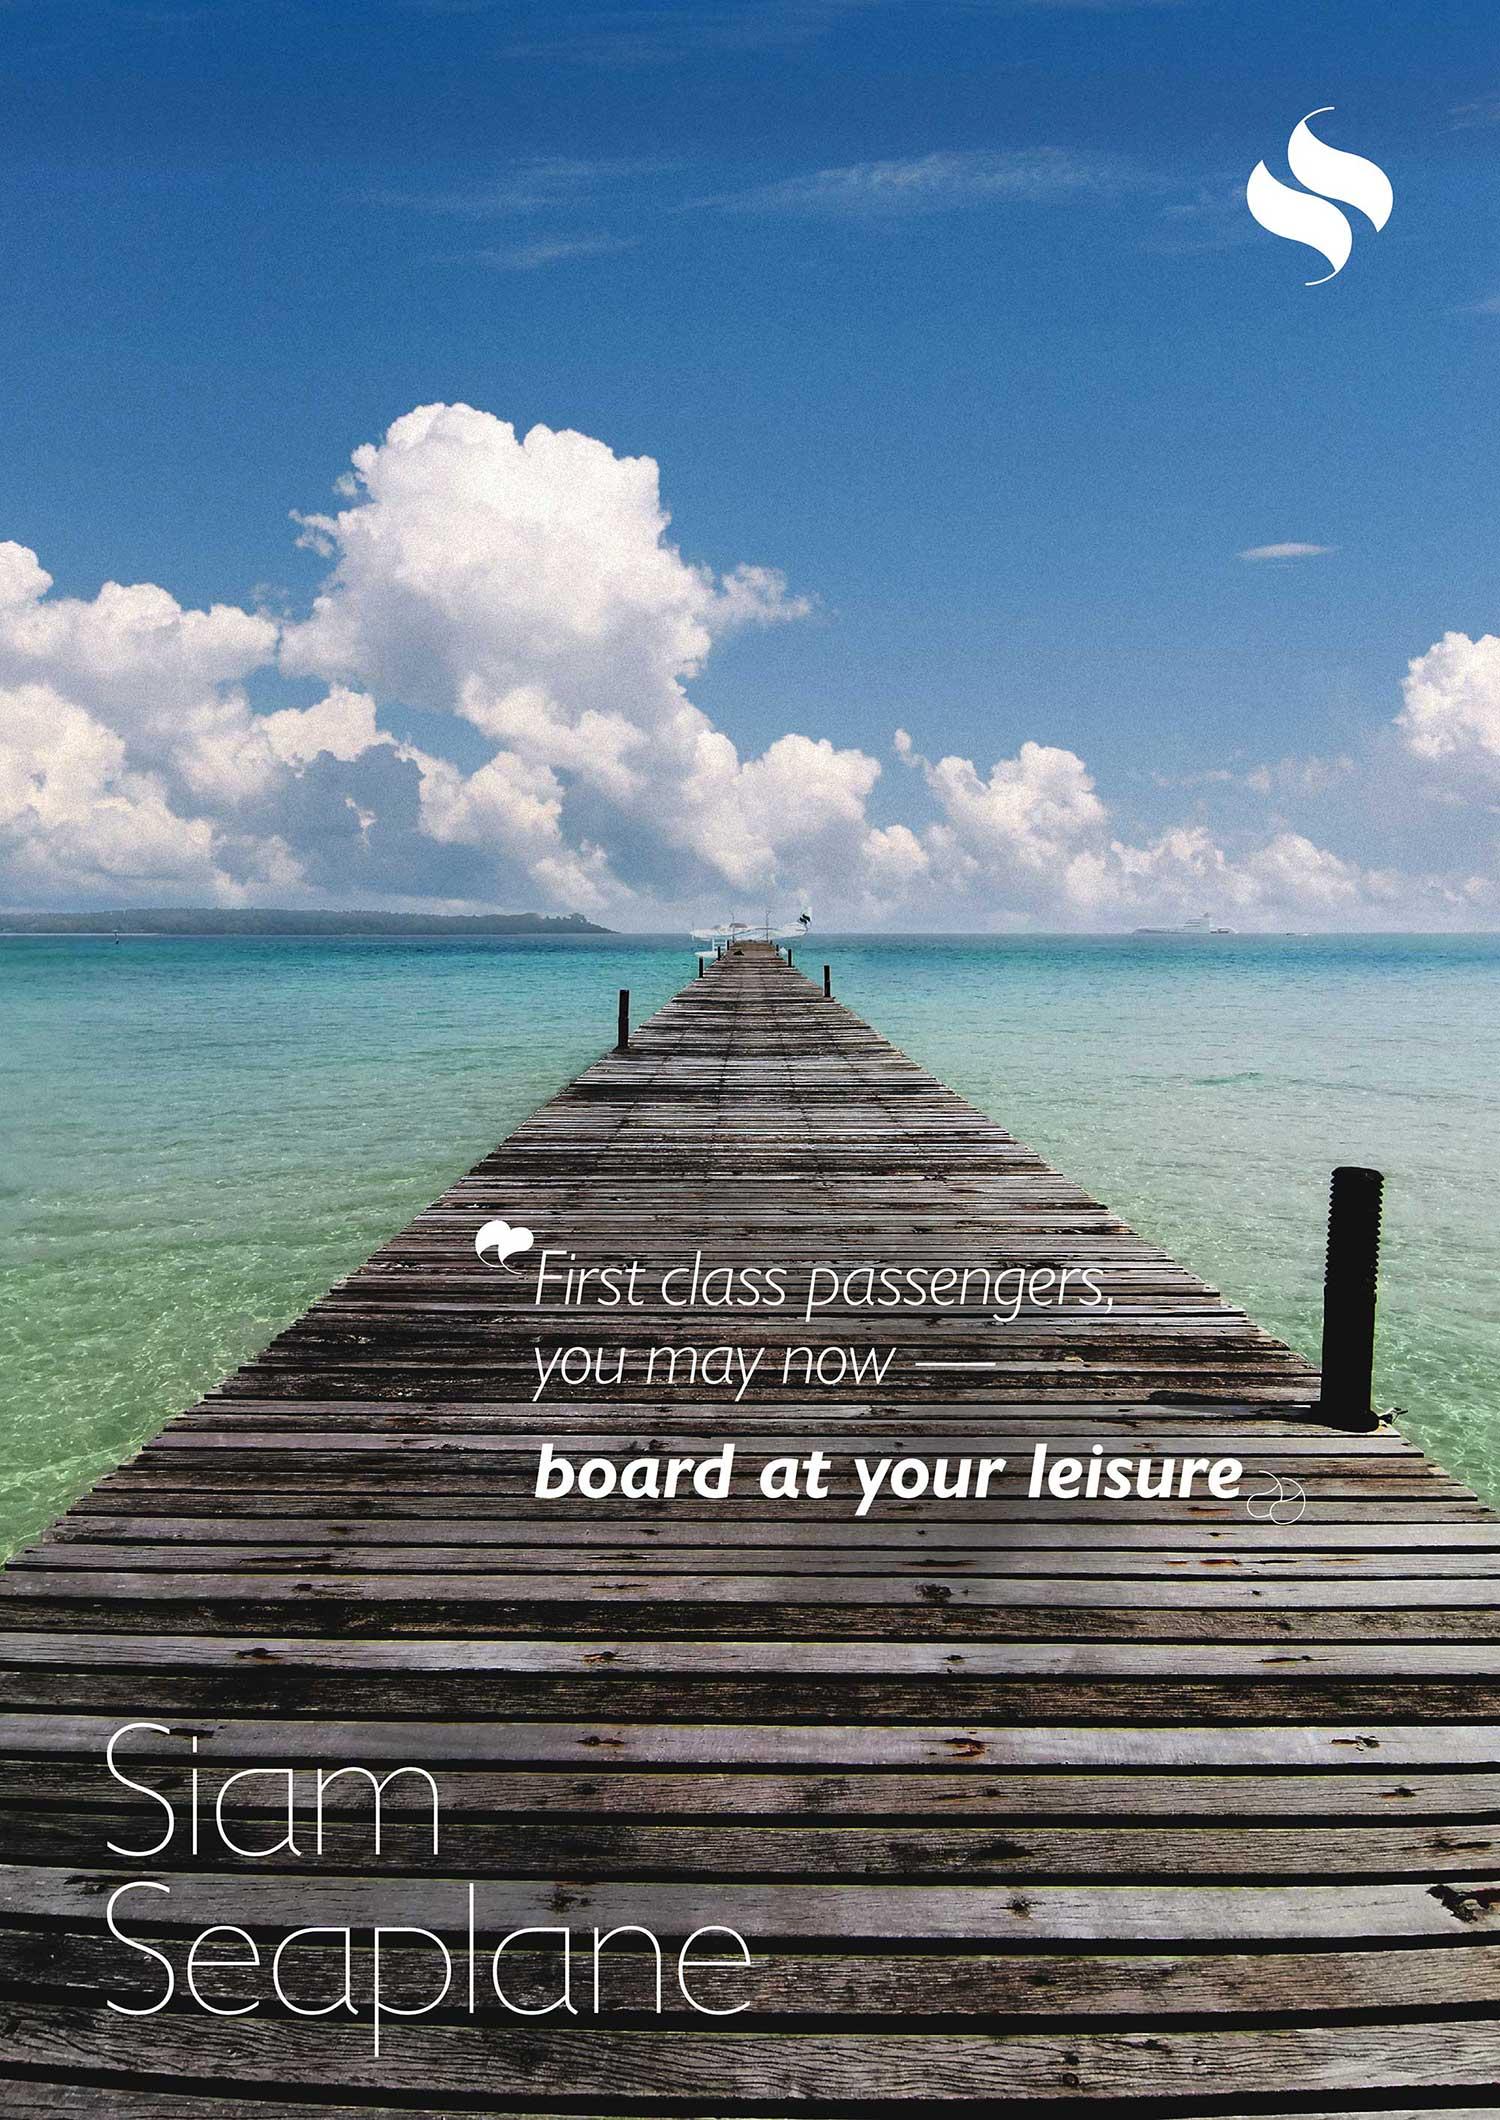 Siam Seaplane dock poster